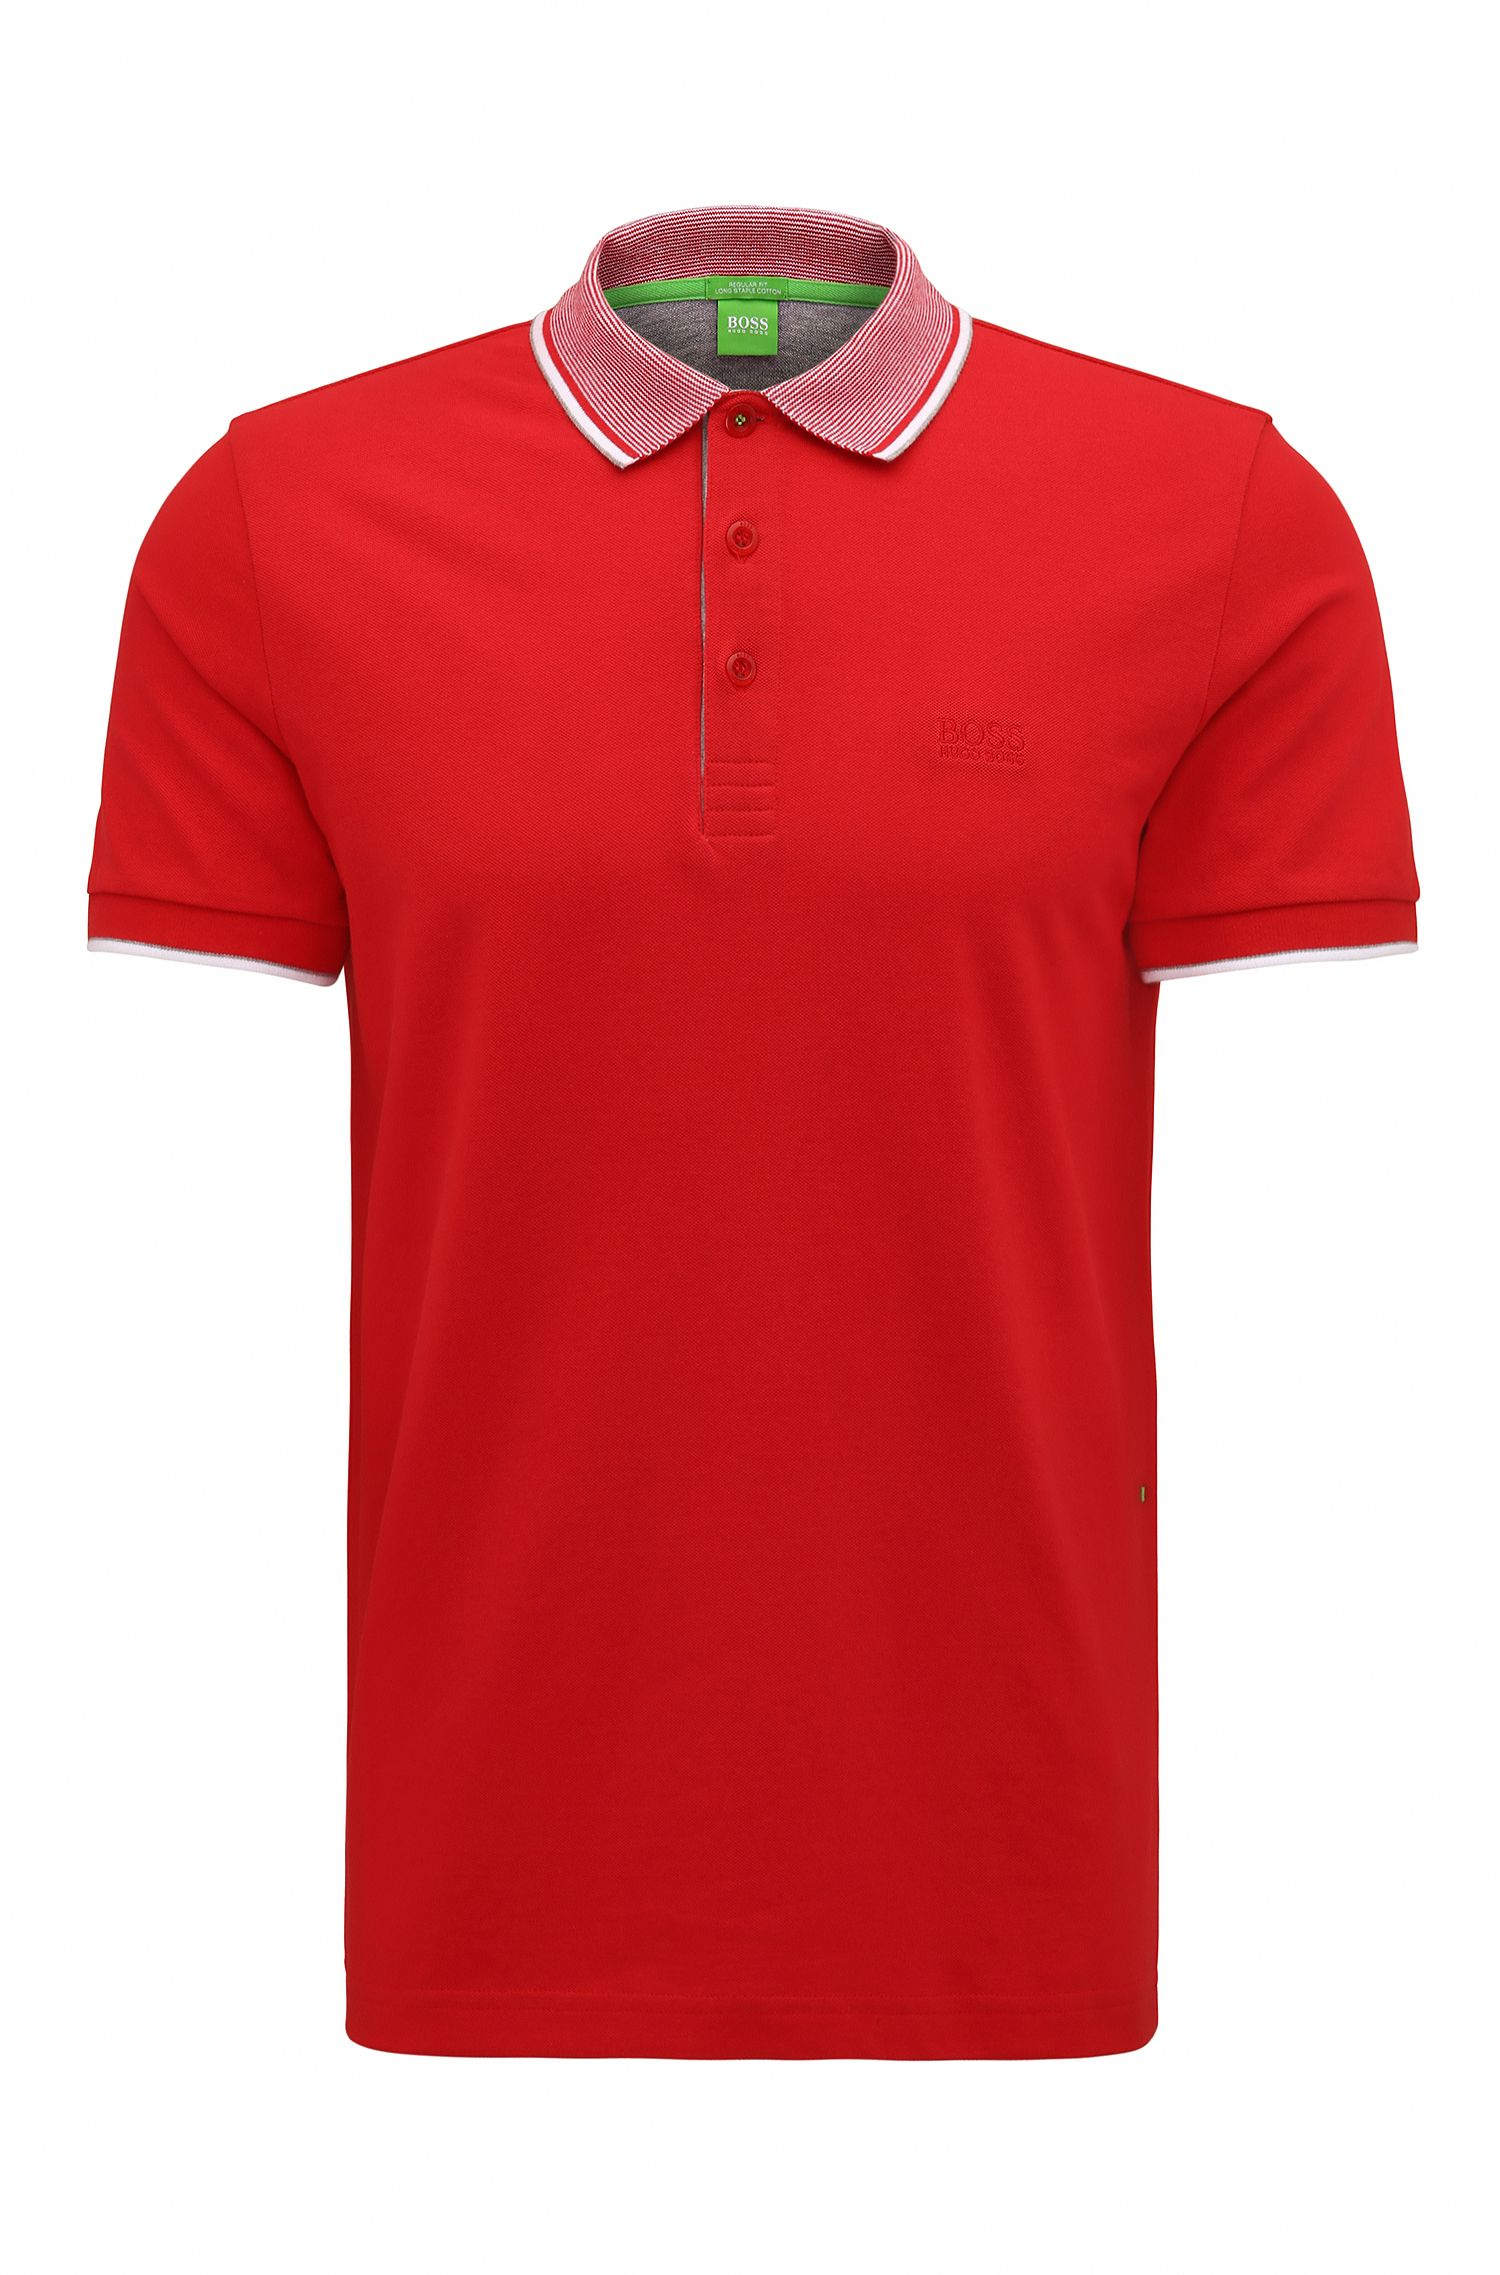 Cotton Piqué Polo Shirt, Regular Fit | Paddos